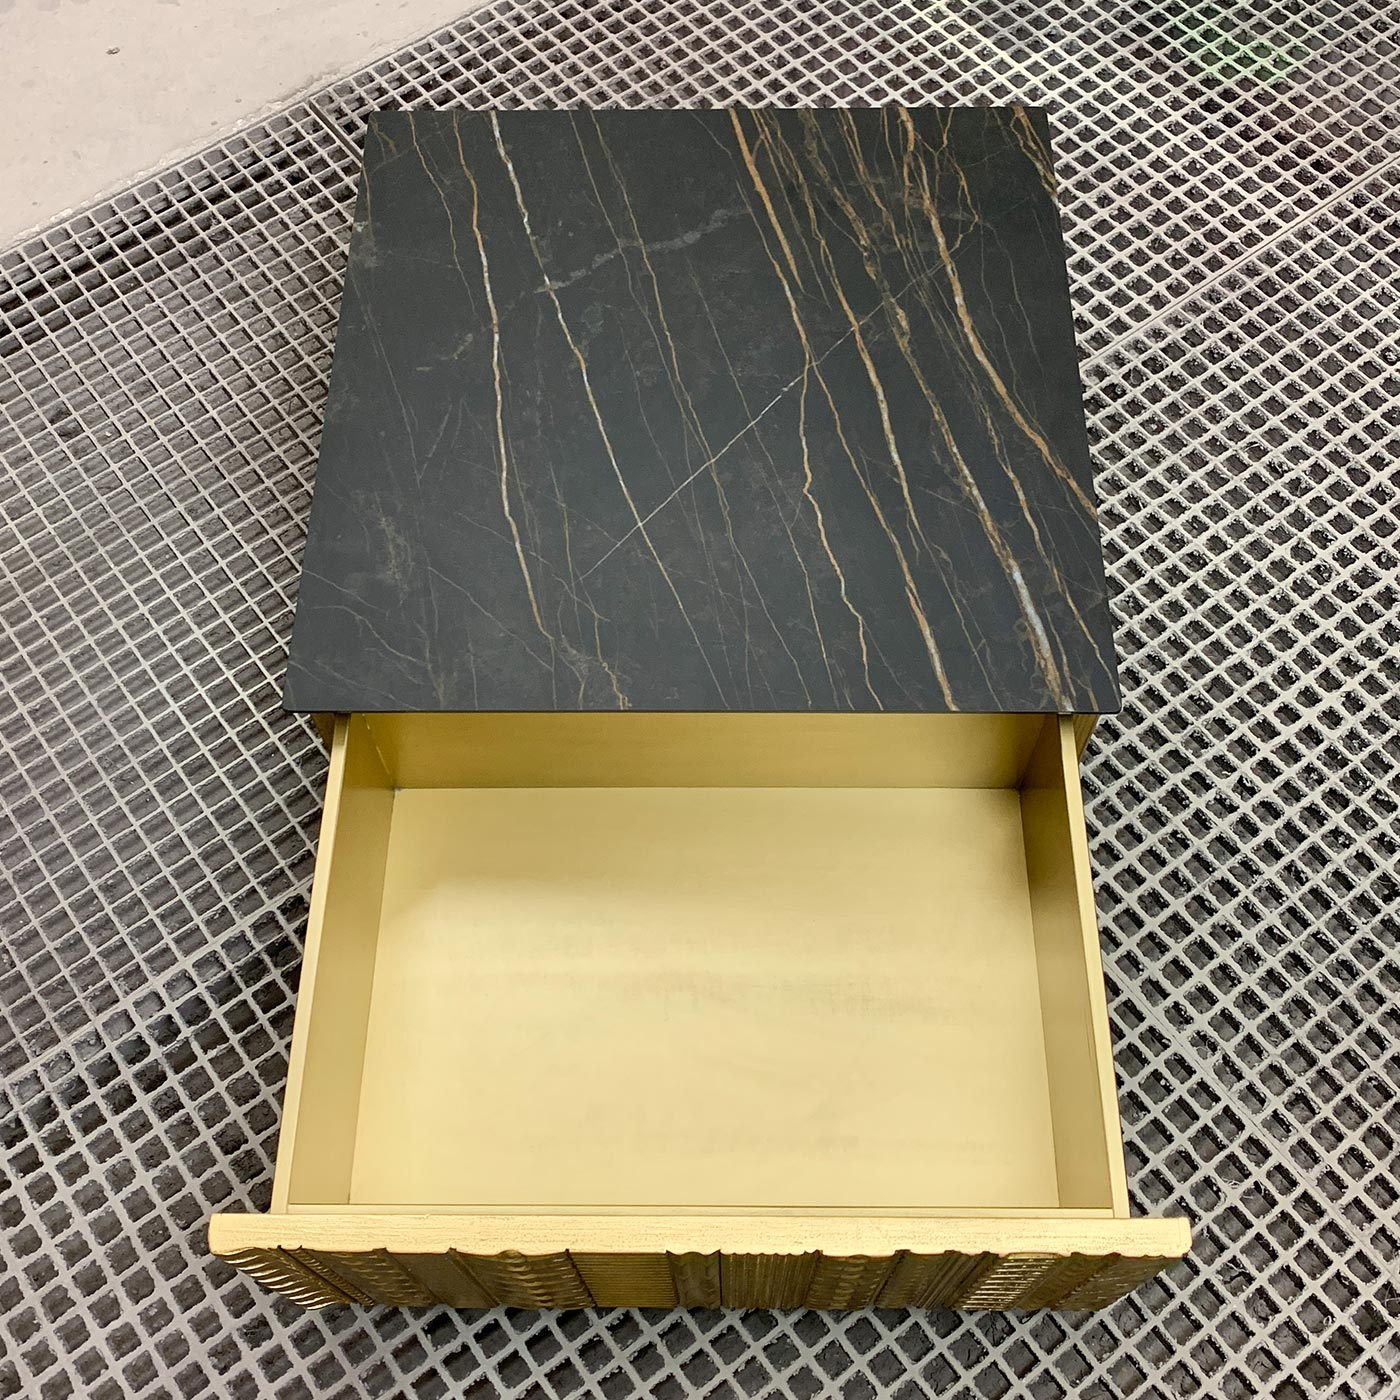 jk_gold_coffeetable_04